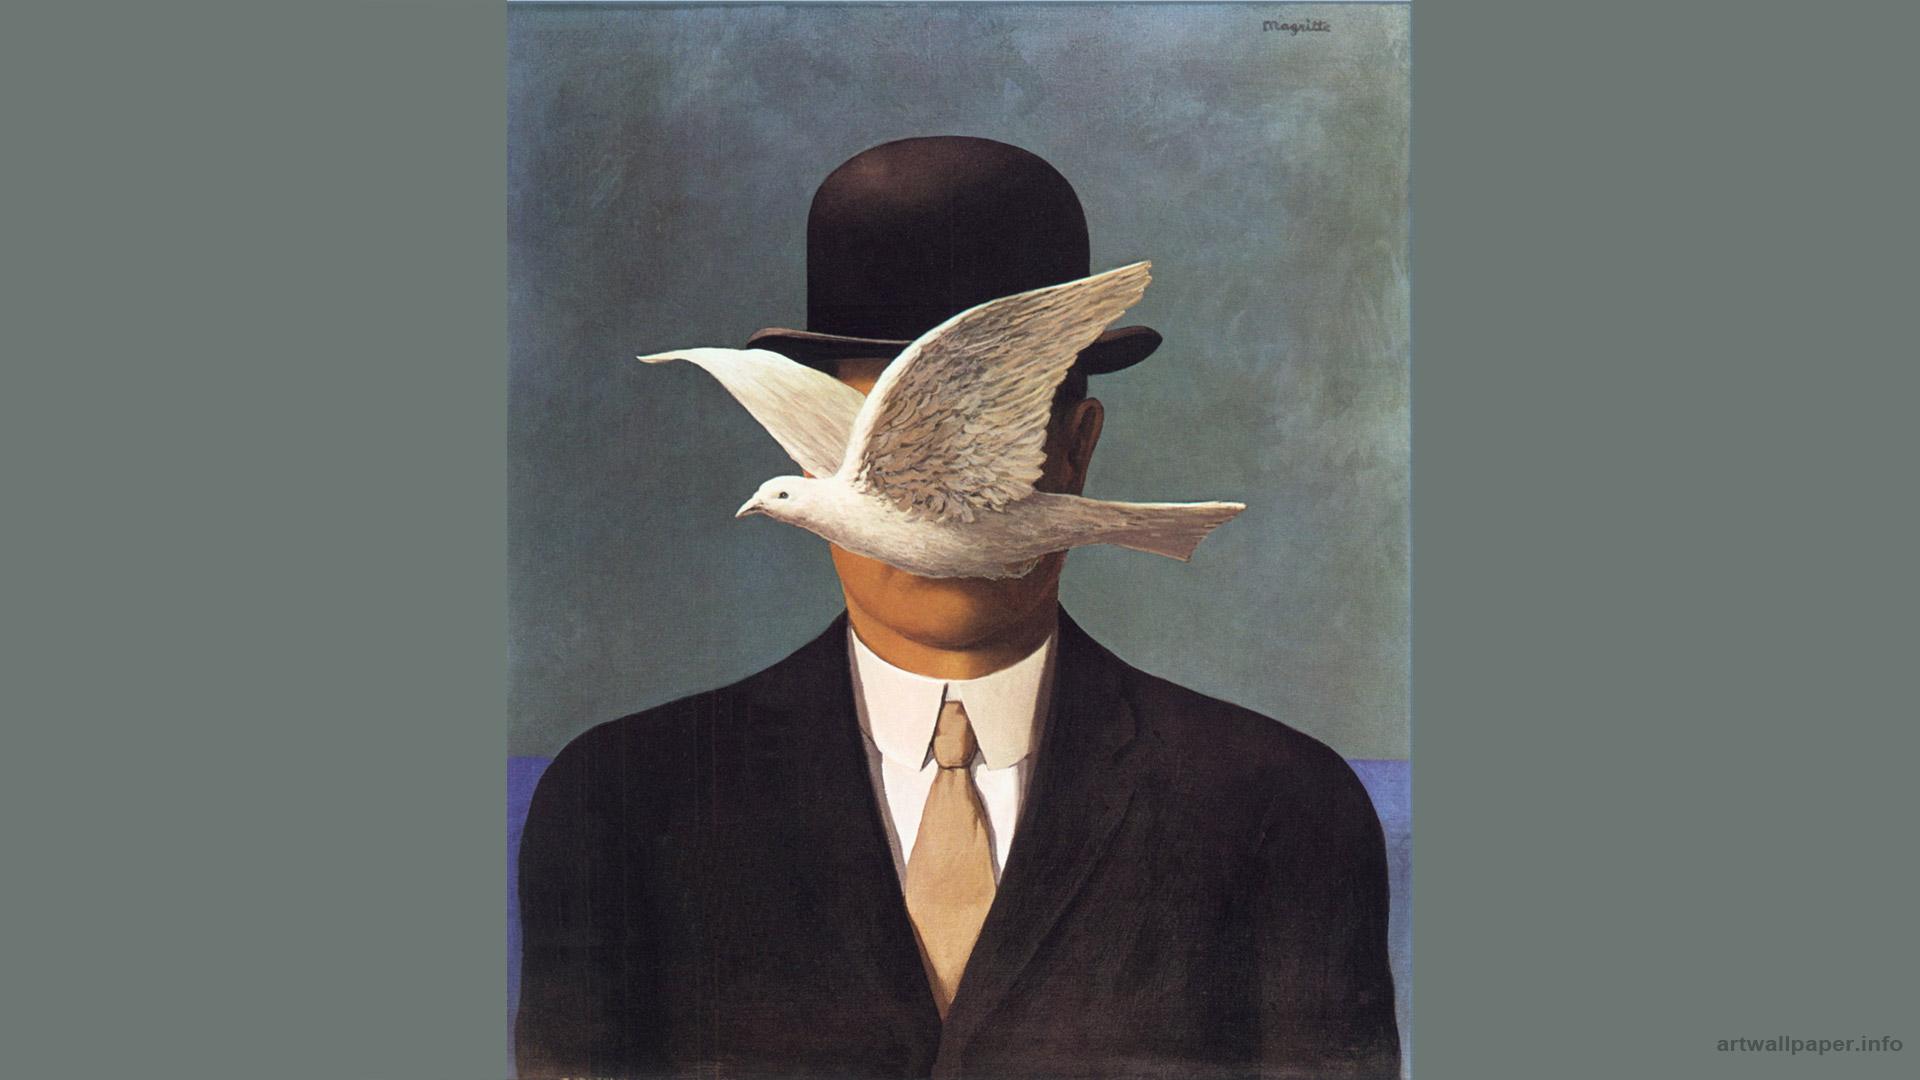 Rene Magritte Wallpaper 04 1920x1080